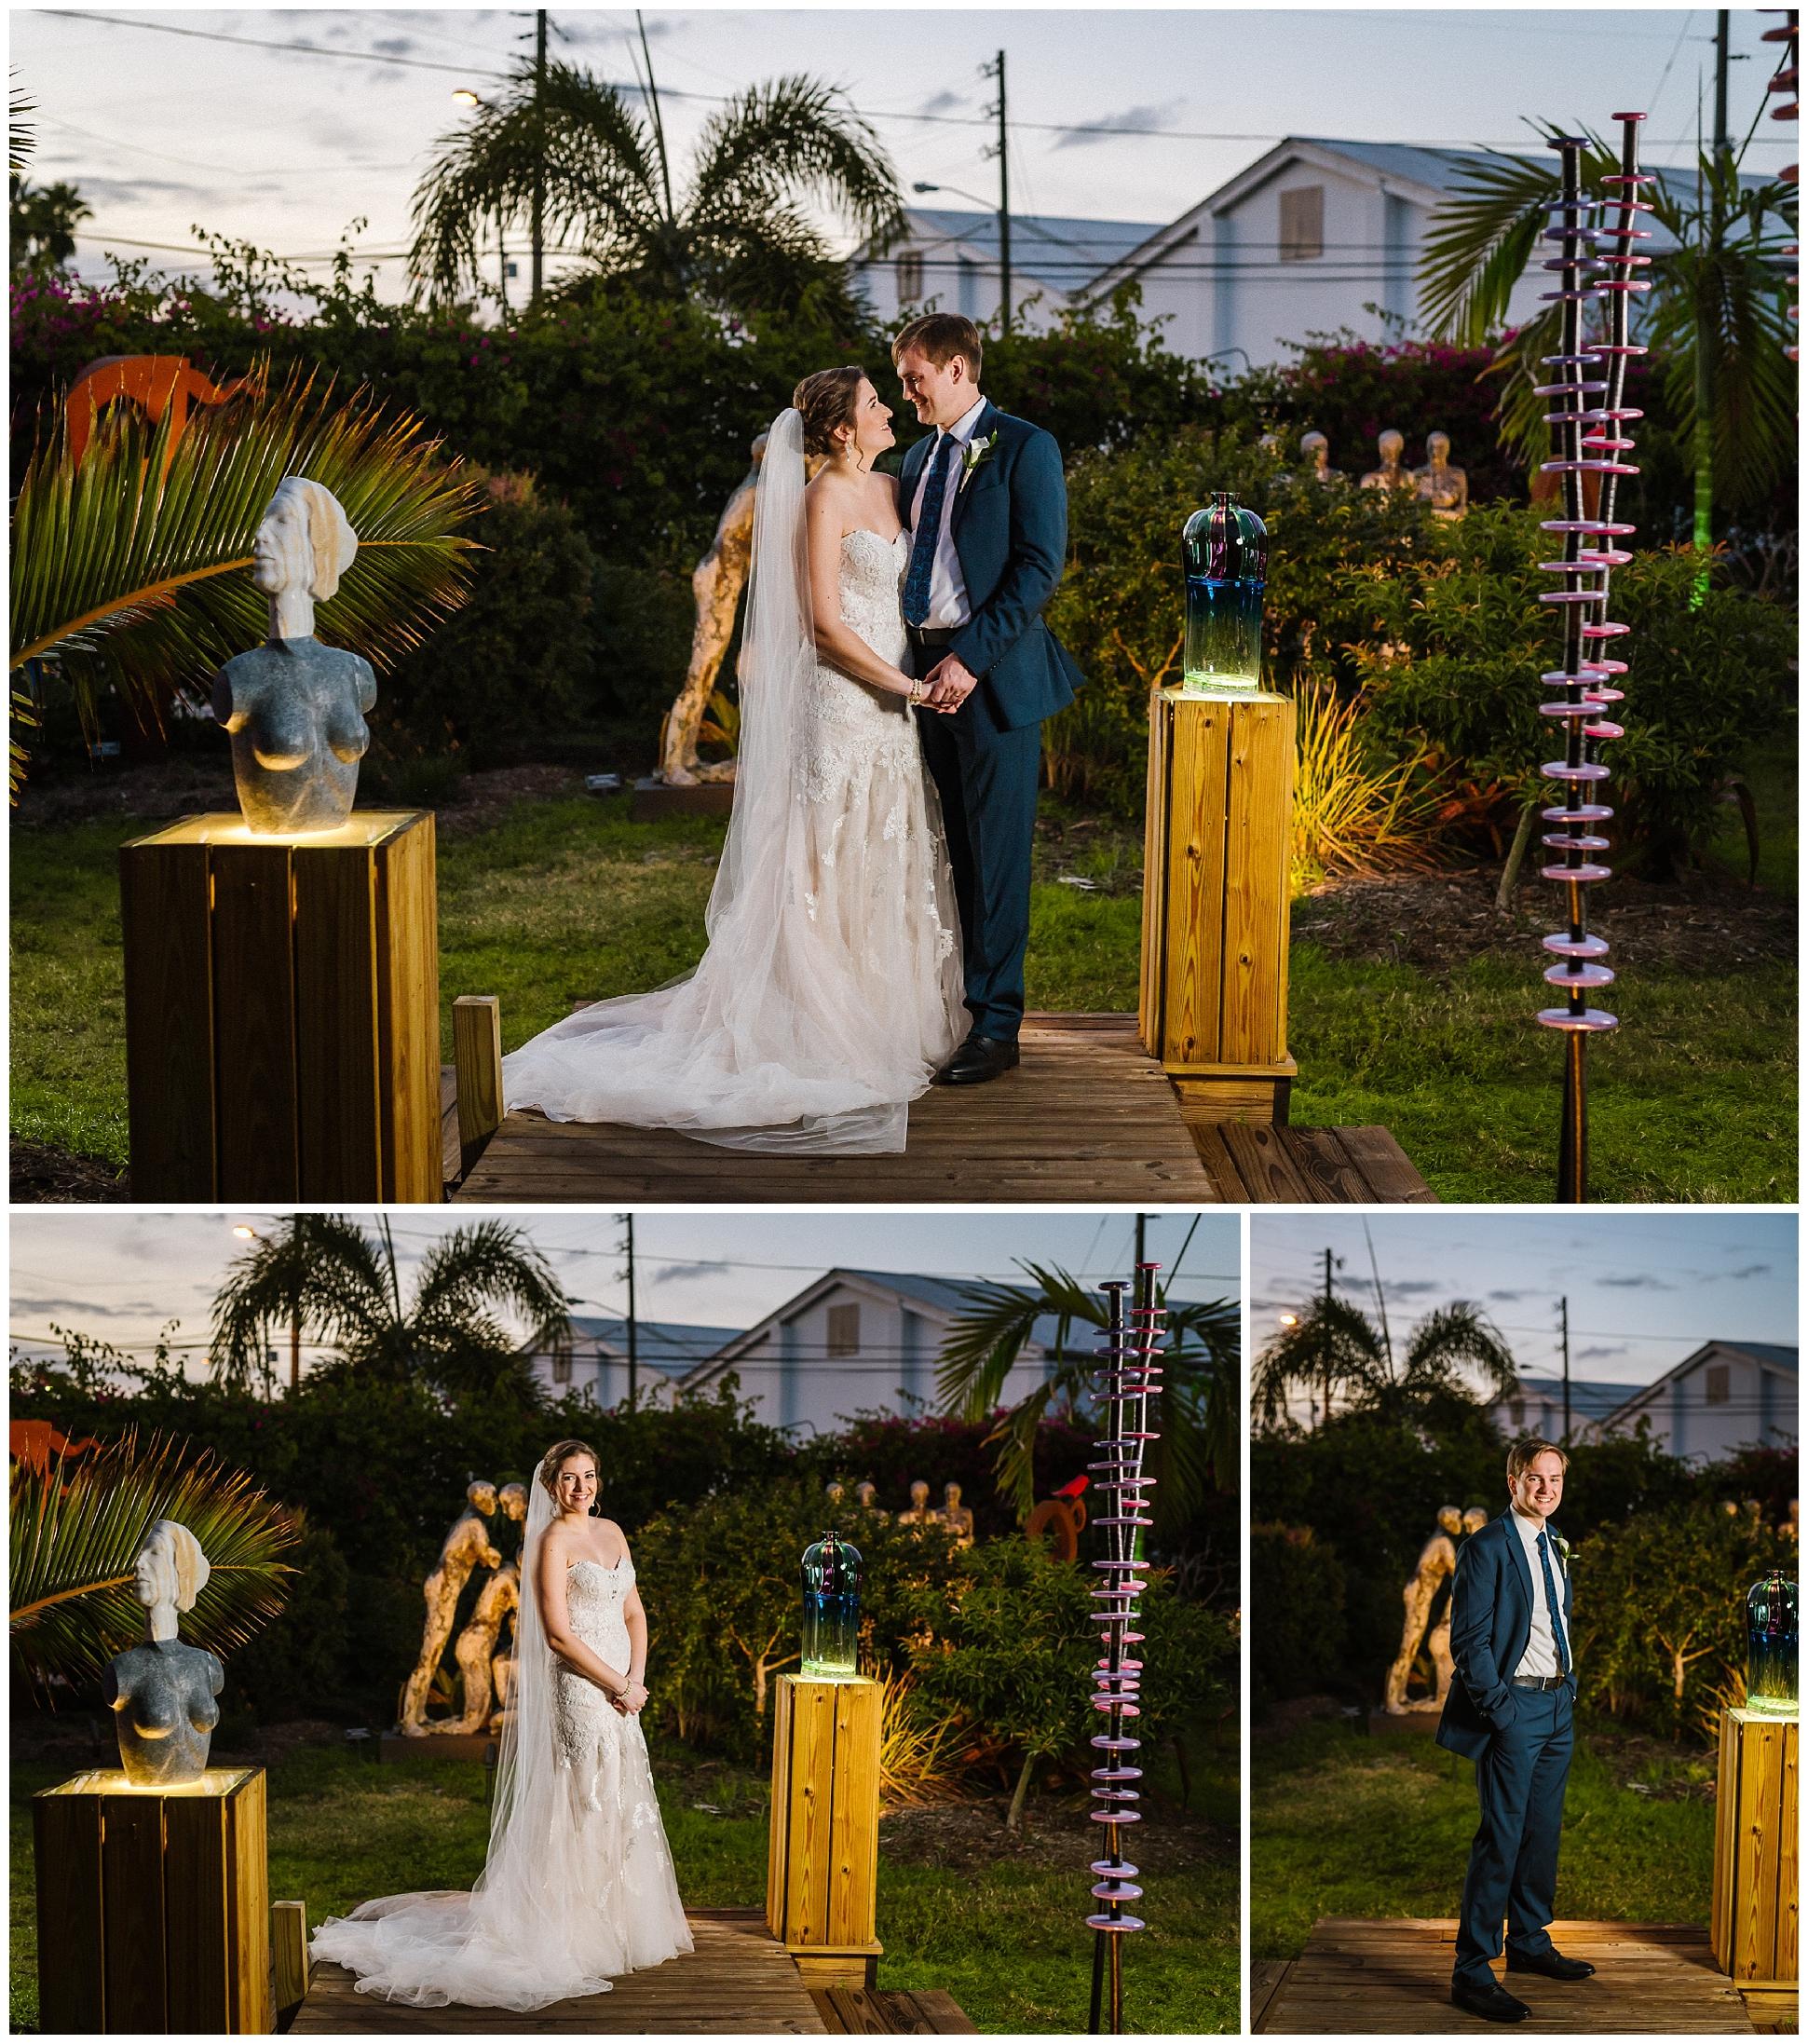 St-pete-wedding-photography-unique-glass-blowing-gallery-succulent-art_0034.jpg